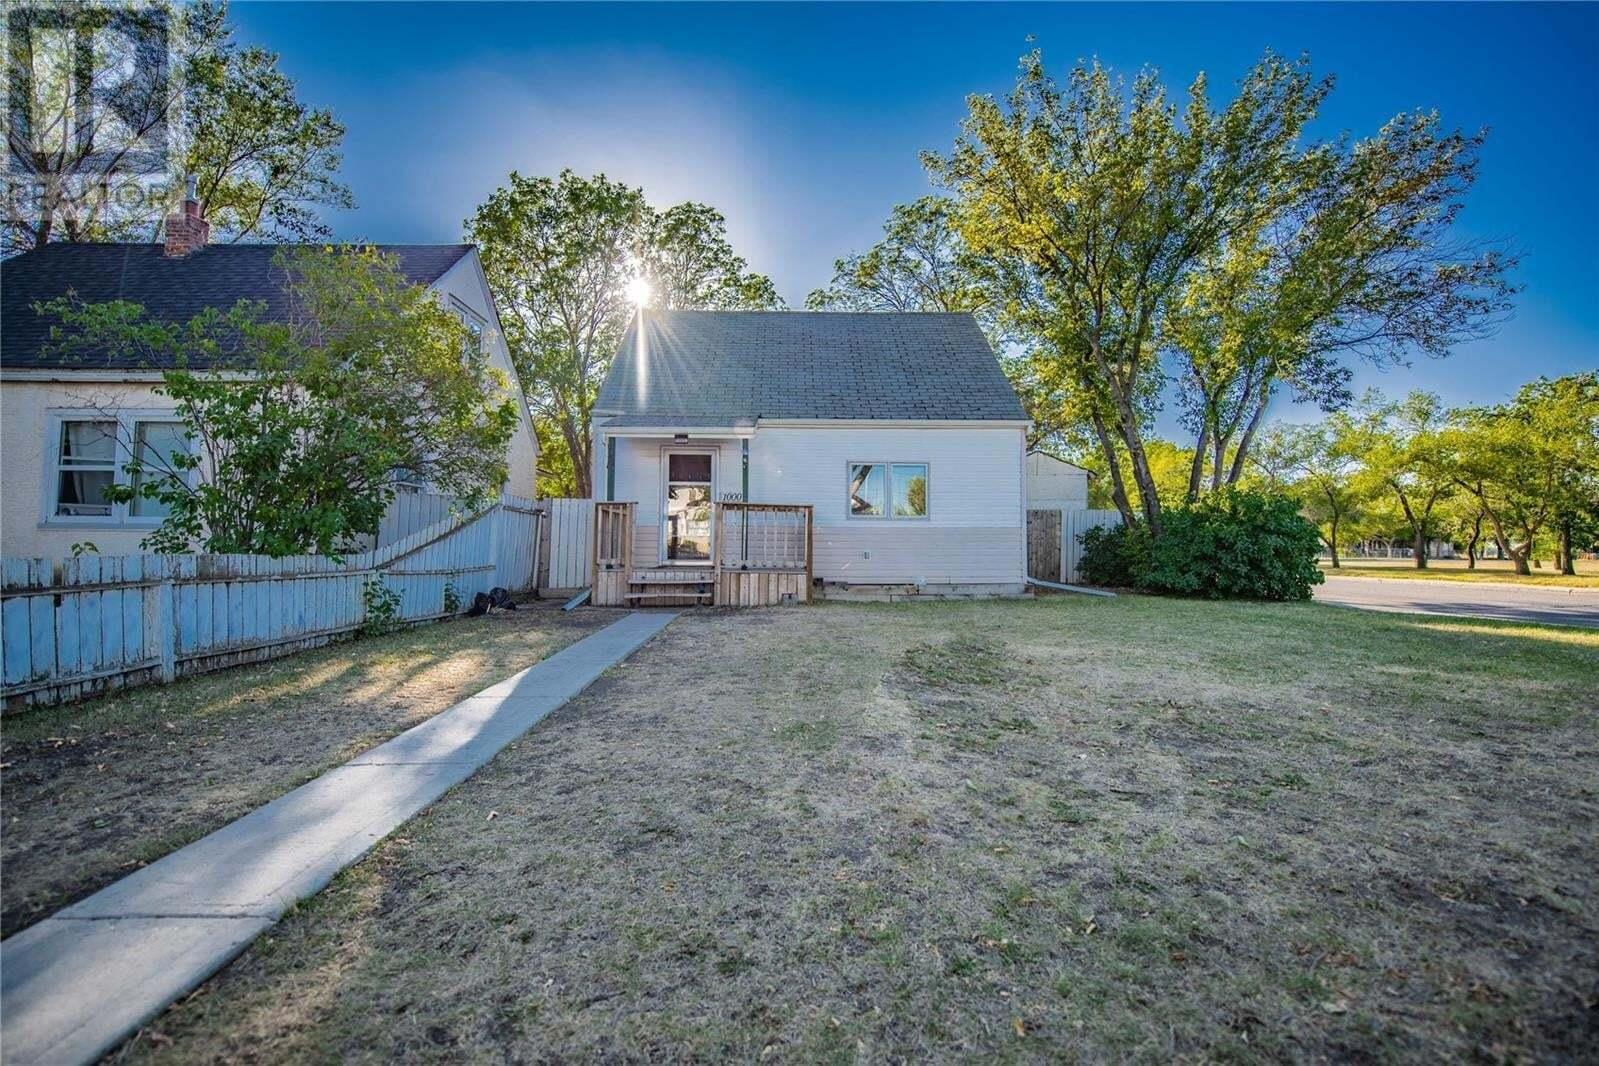 House for sale at 1000 Cameron St Regina Saskatchewan - MLS: SK824646